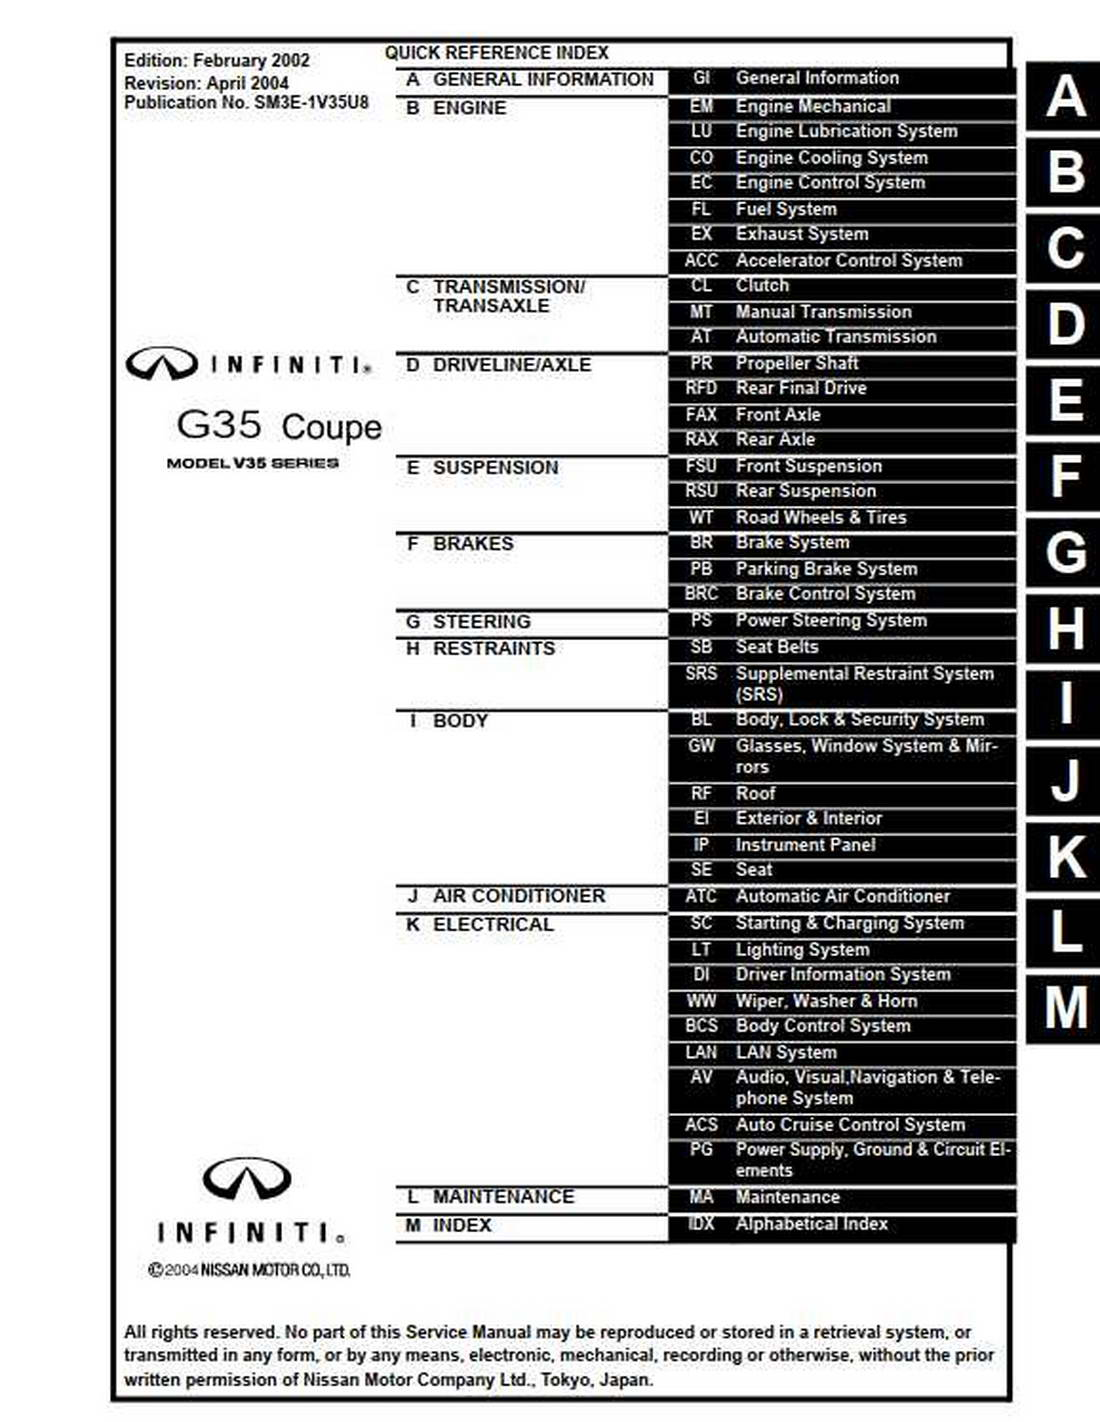 Infiniti G35 Coupe Model V35 Series Service Manual